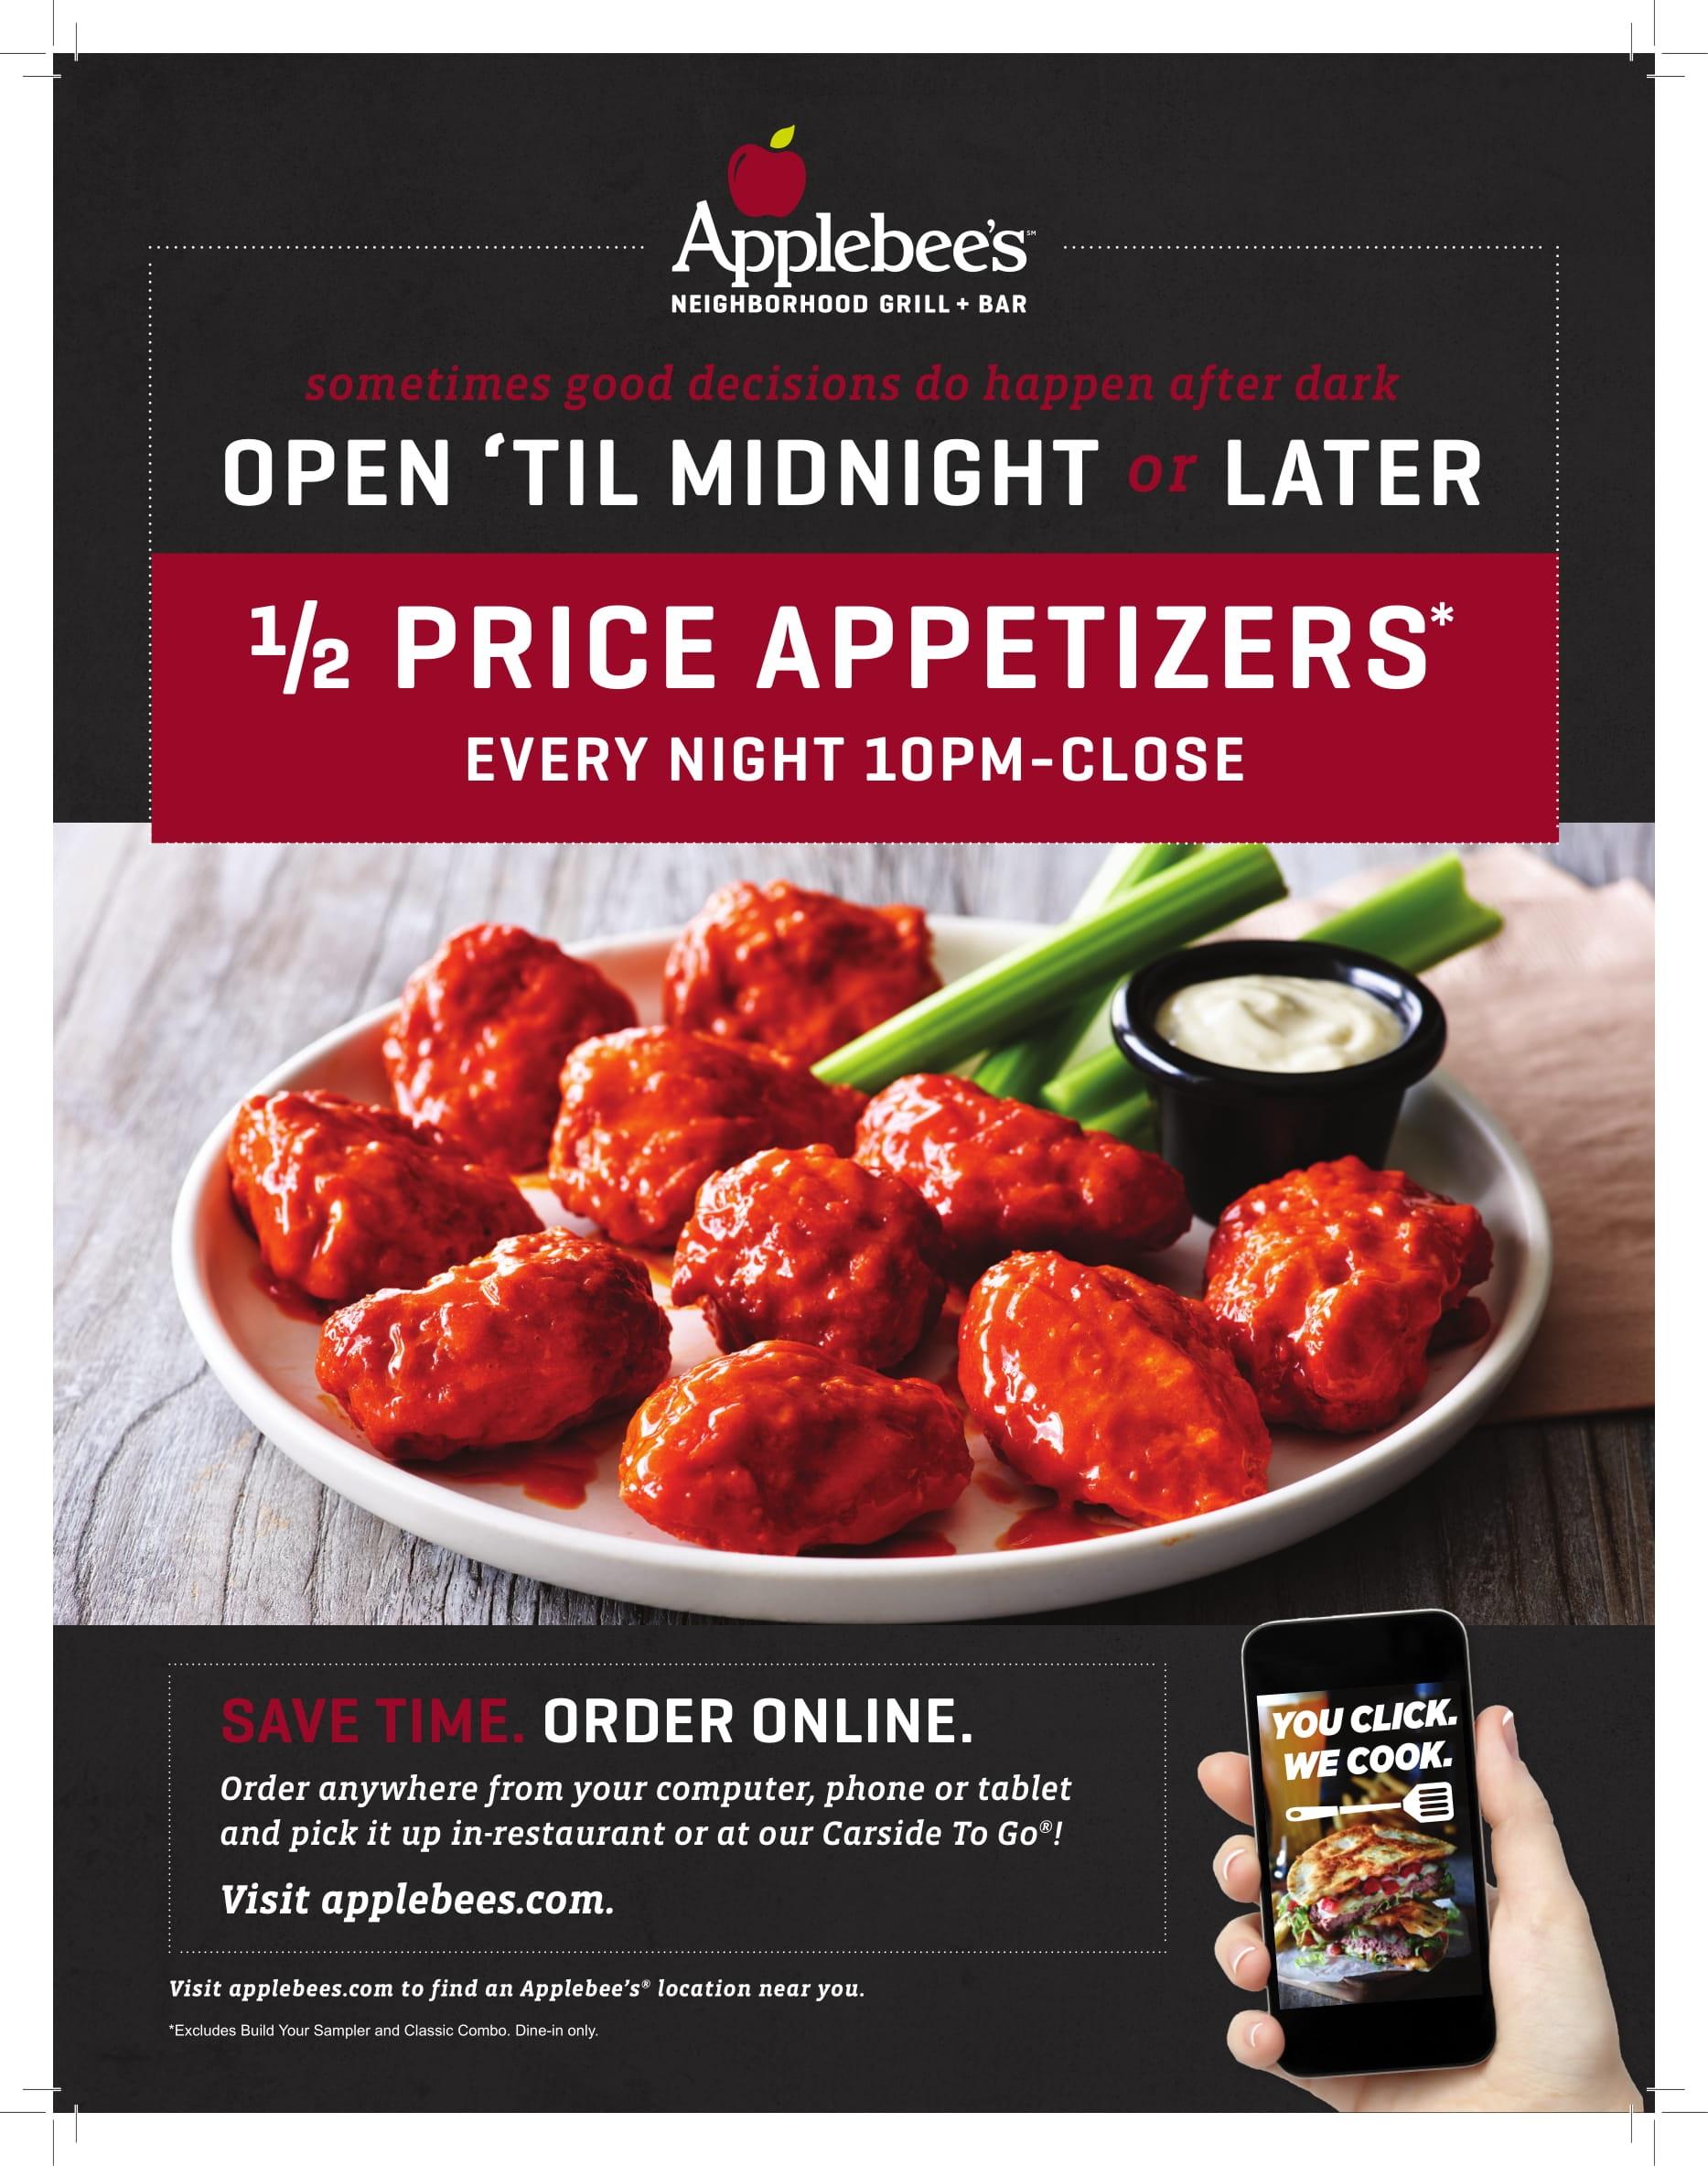 Applebee's Appetizer Special.jpg